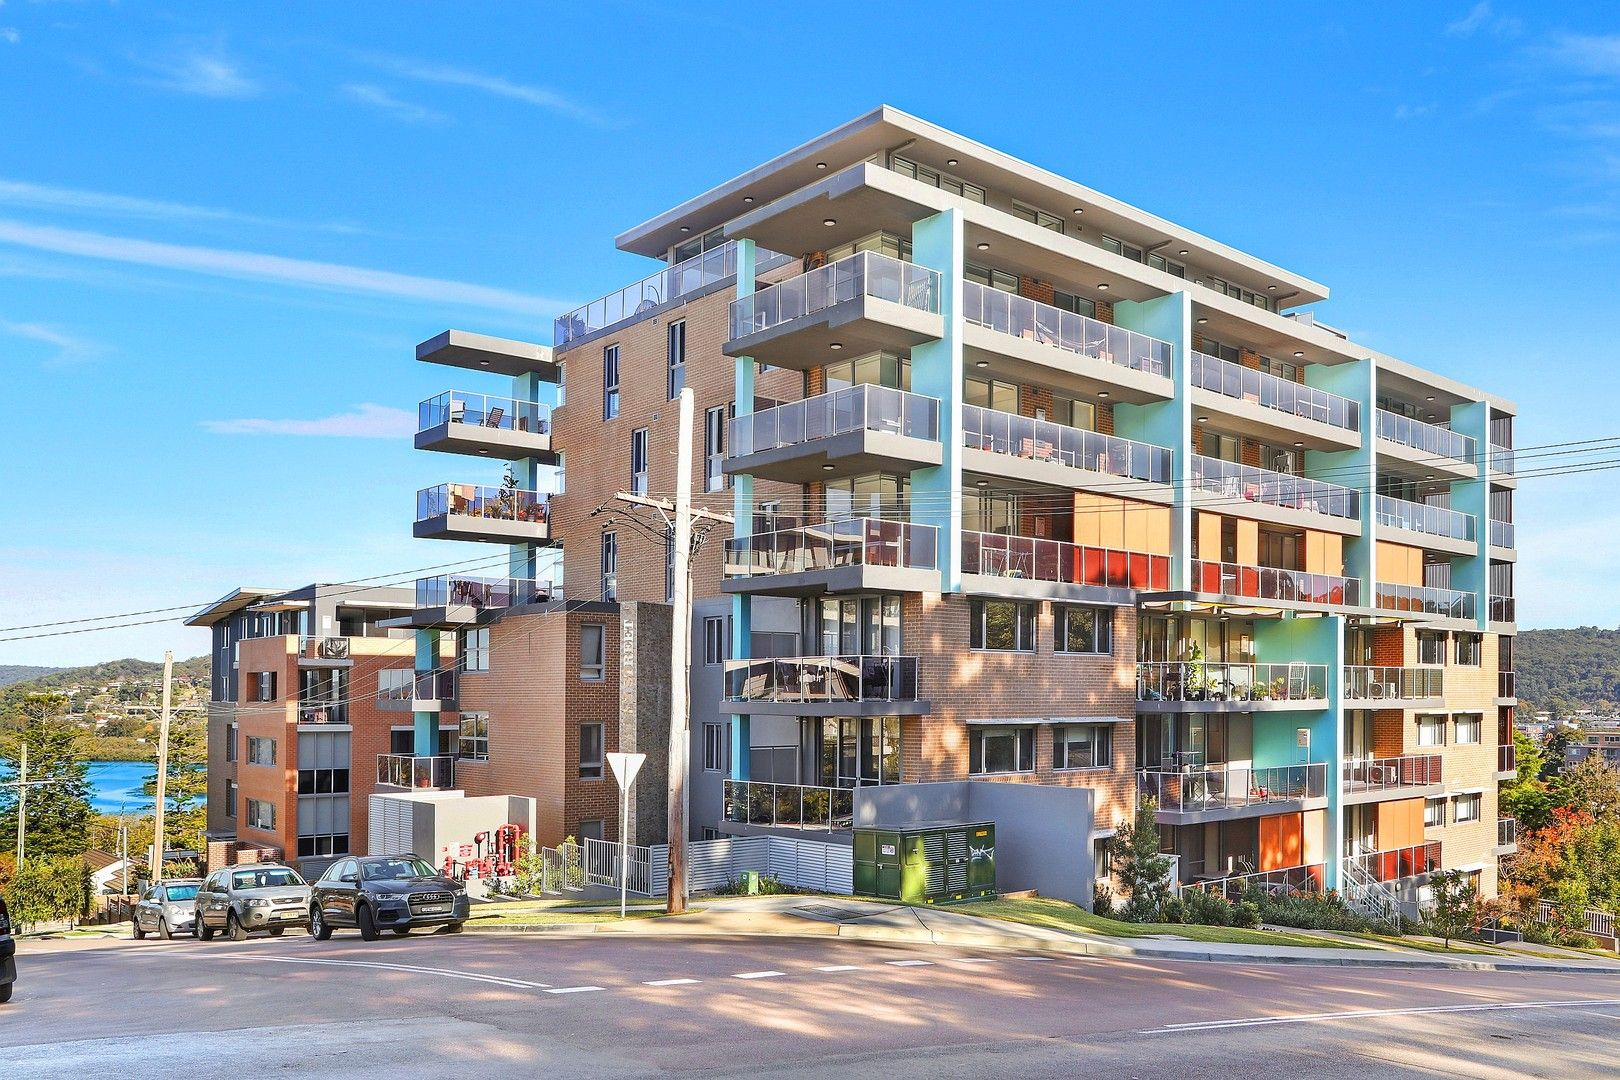 7/14 Batley Street, West Gosford NSW 2250, Image 0